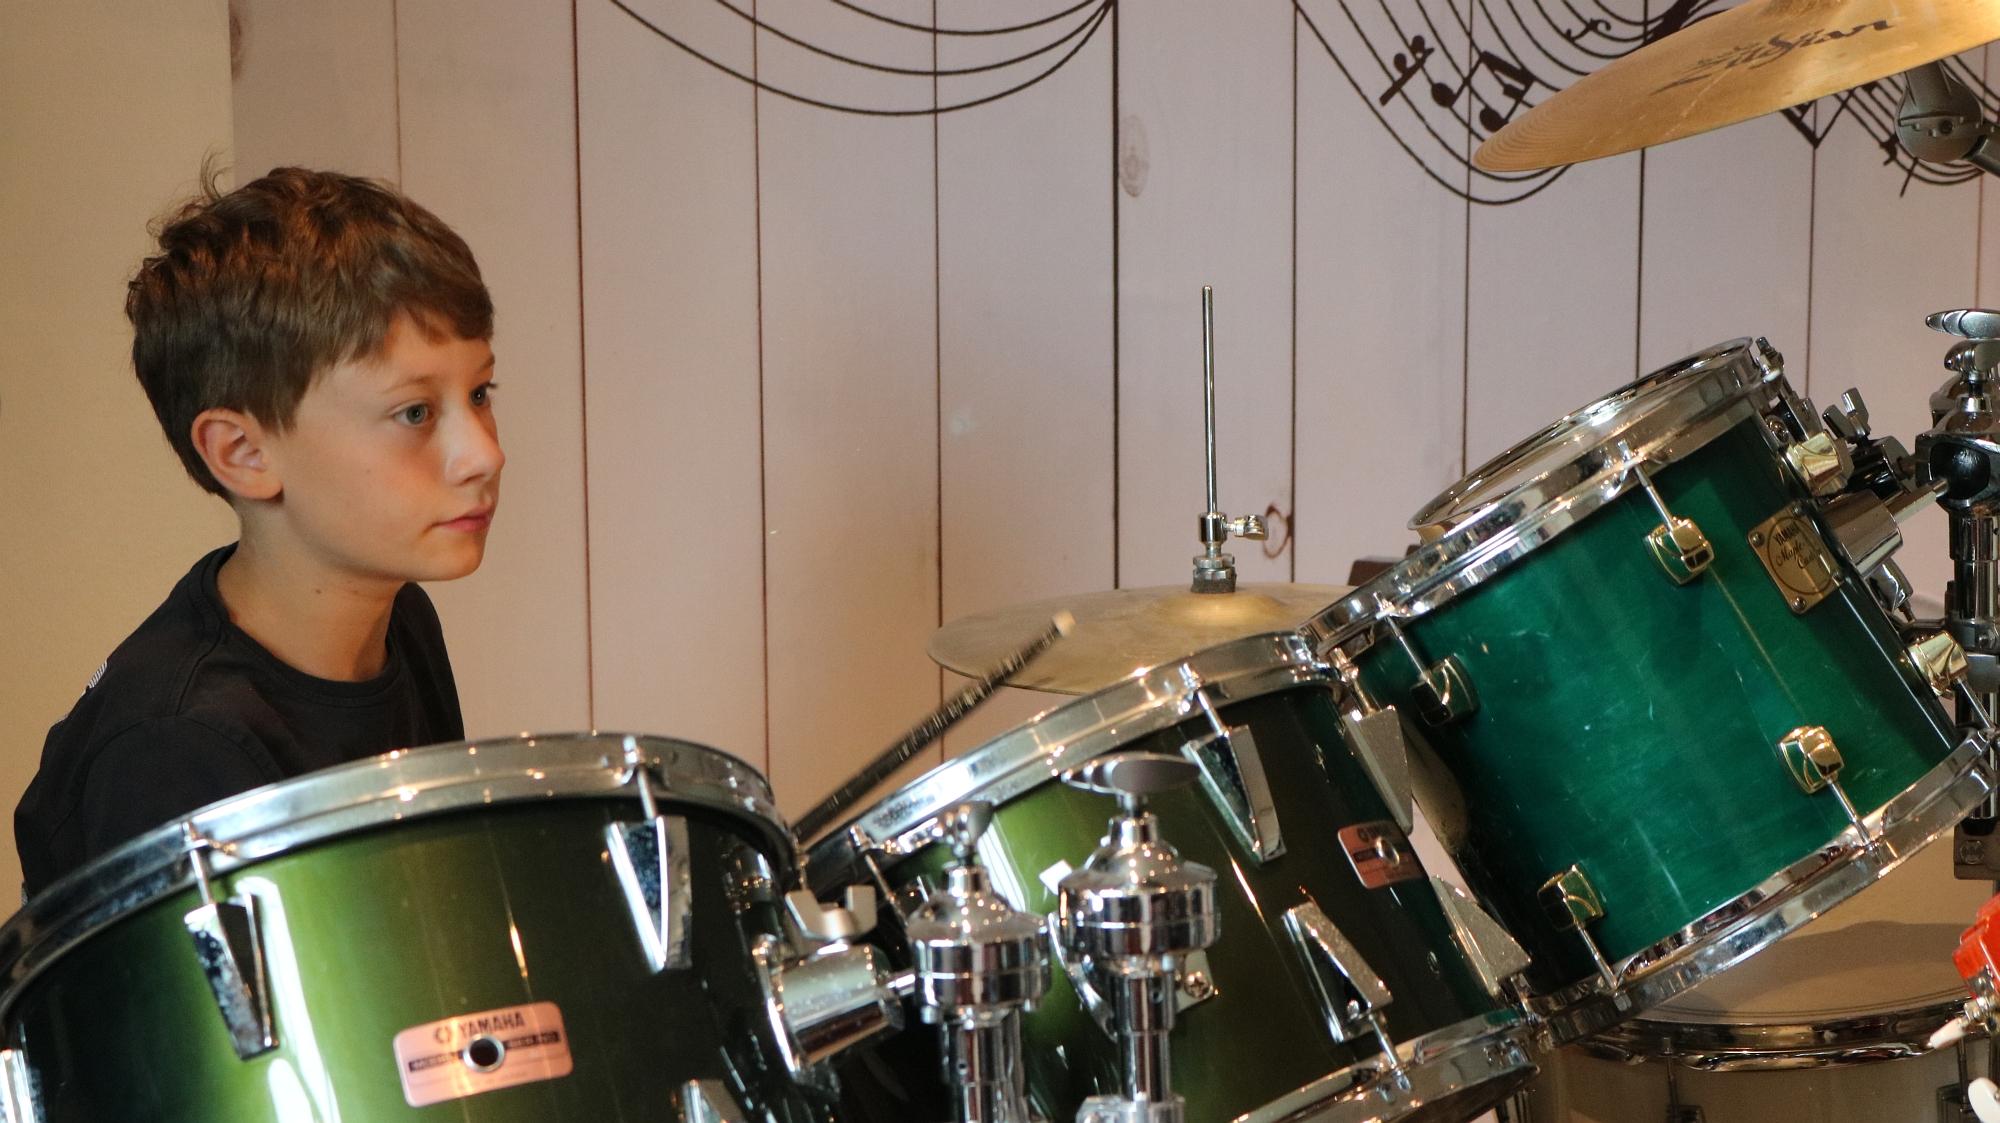 202007 Bandprobe FP Musikschule Harmonie 11